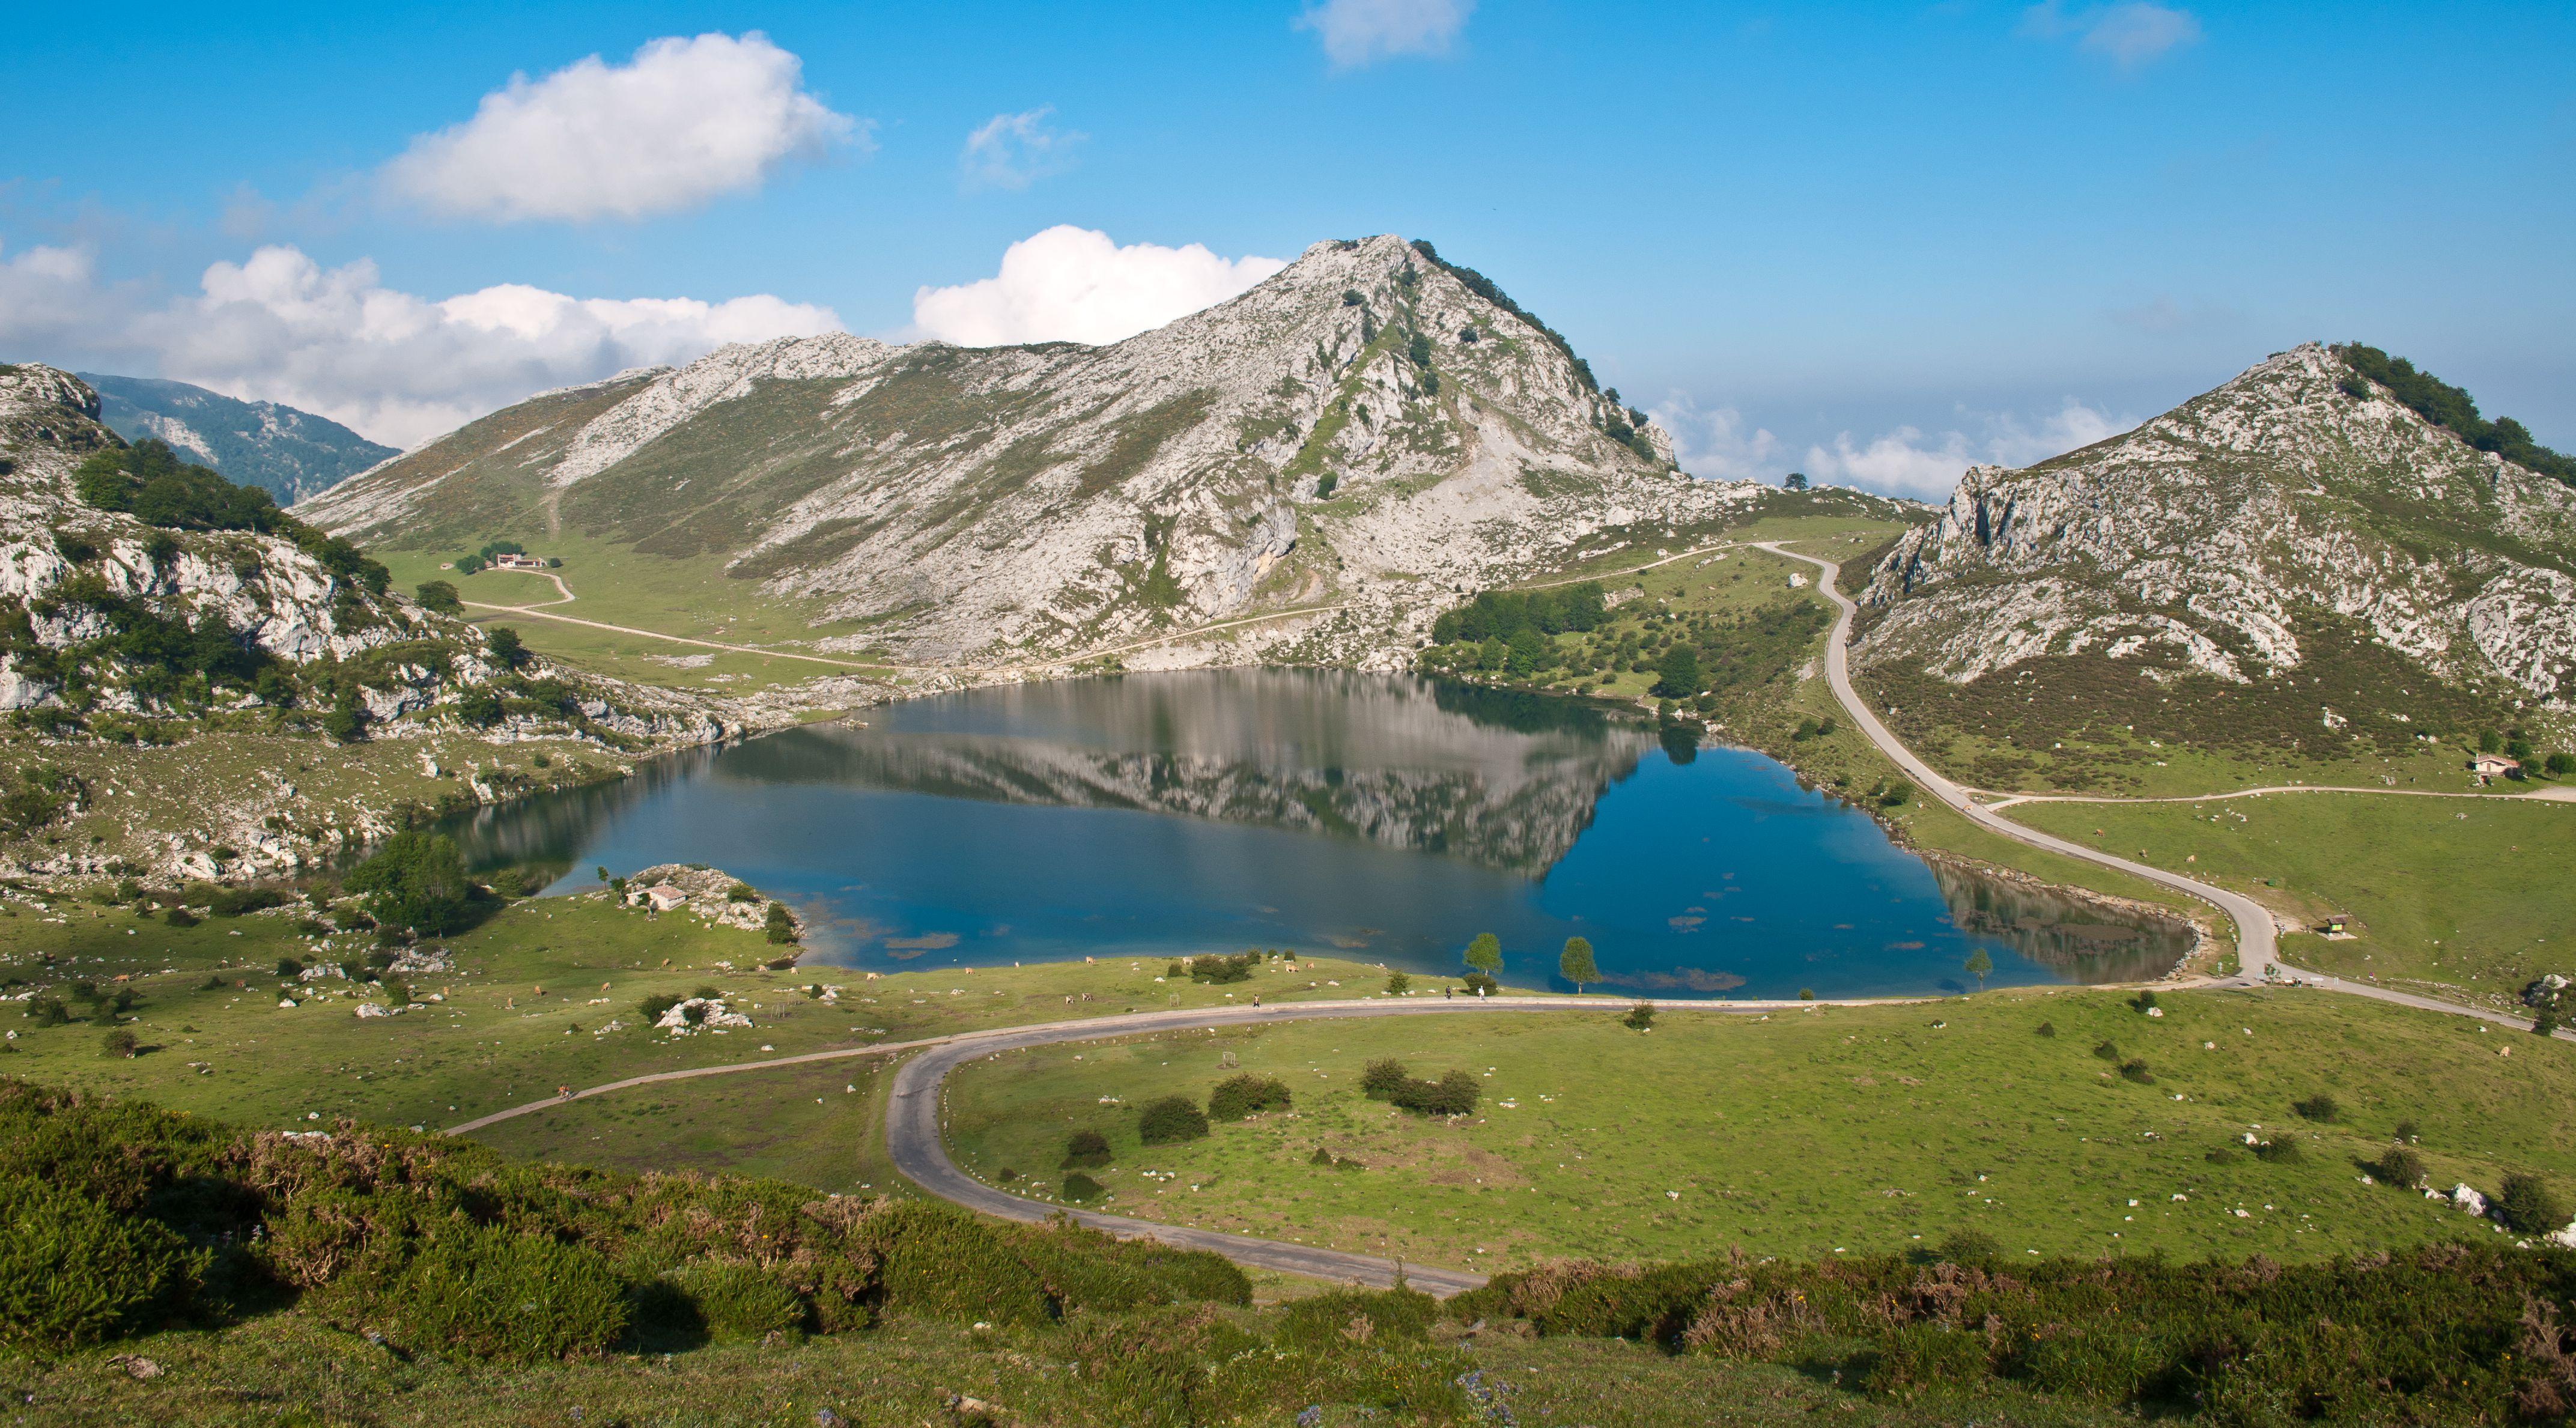 Lago Enol Covadonga Lagos De Covadonga Virgen De Covadonga Picos De Europa